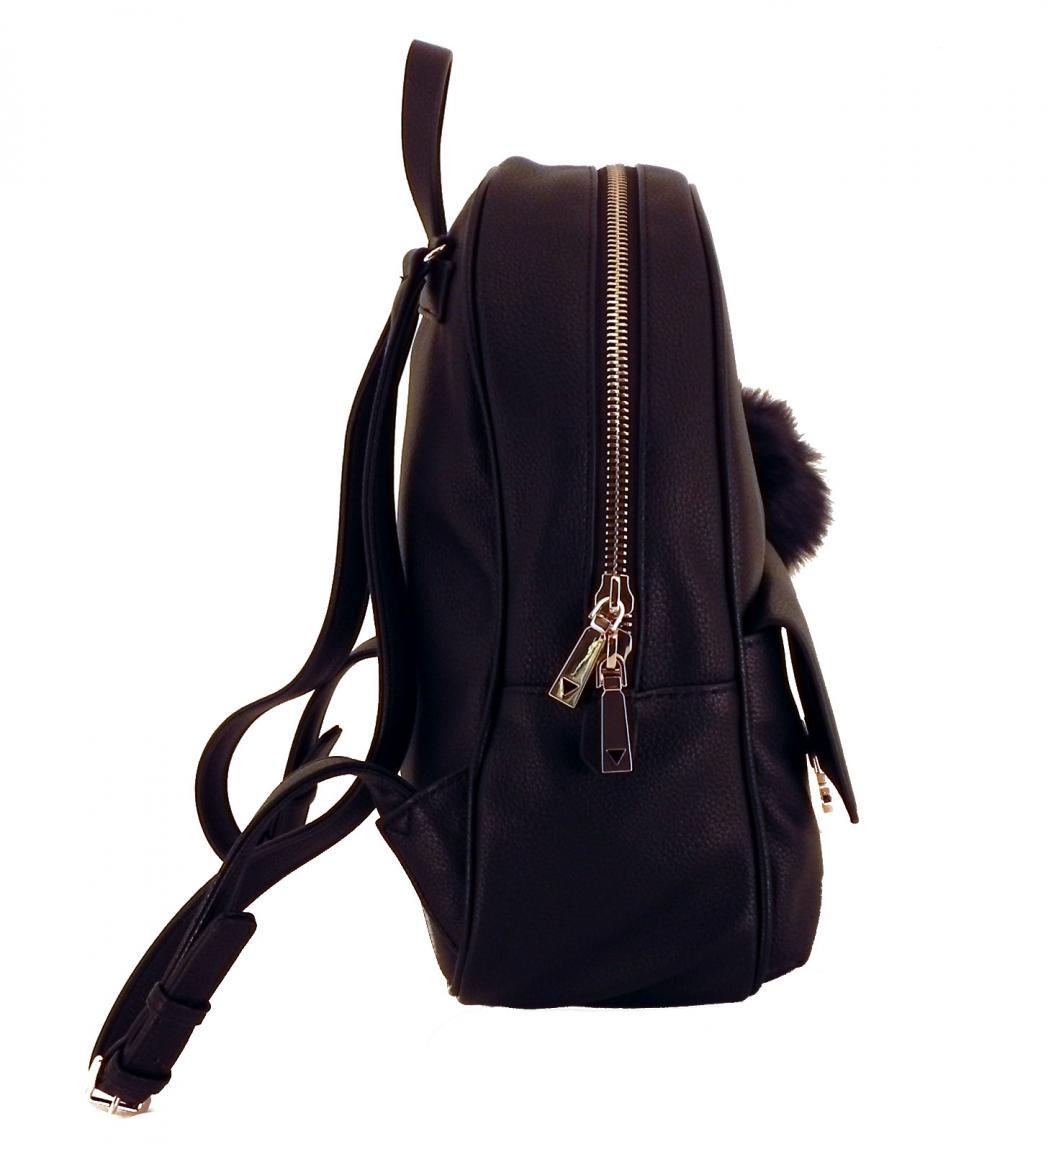 Cityrucksack Guess Tamra Small Backpack Stone grau Prägung